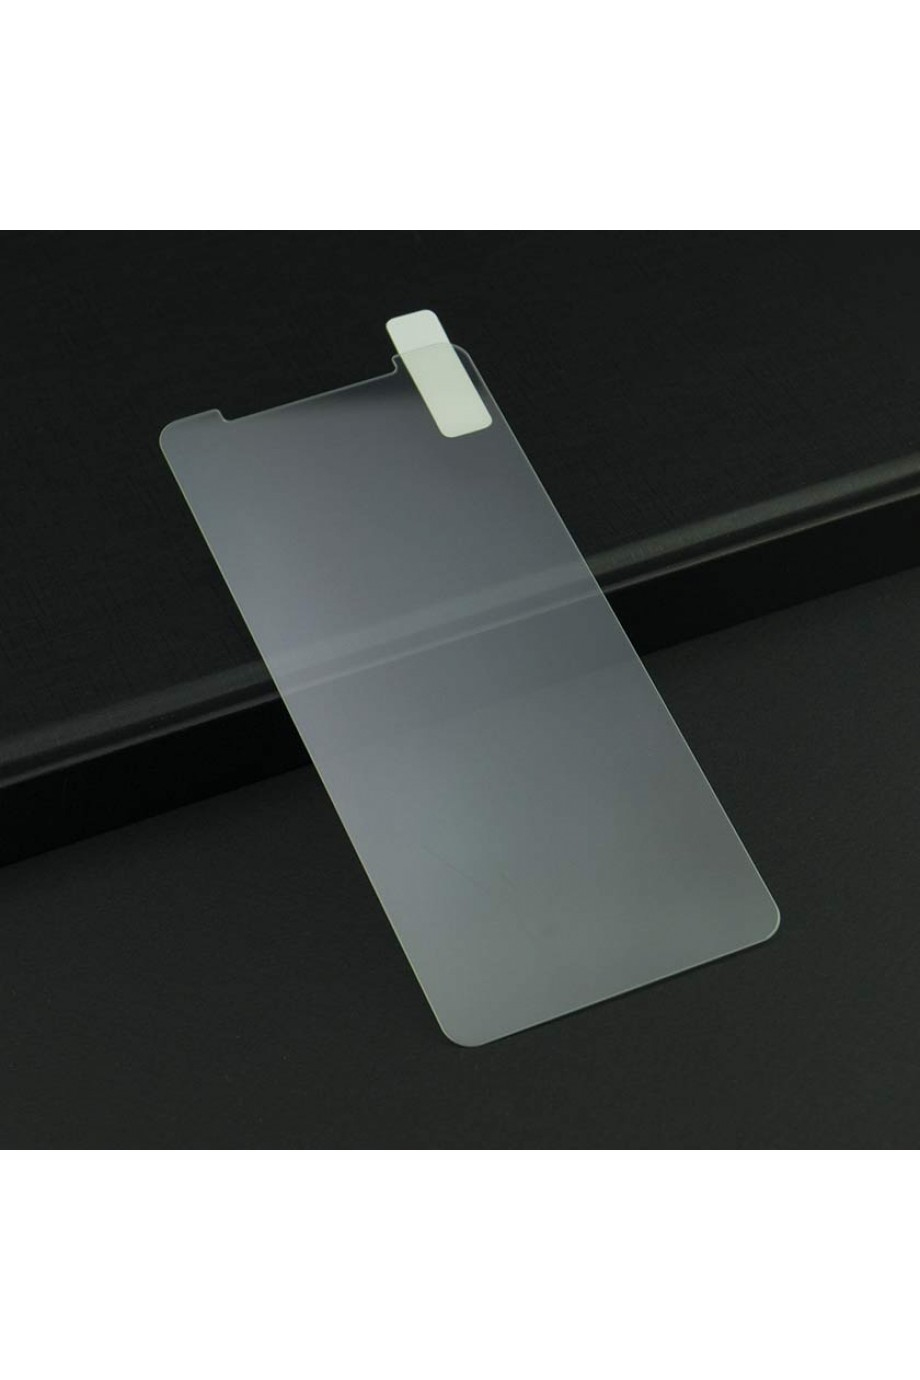 Защитное стекло Mikomo для Huawei Y5 Prime 2018, mk24